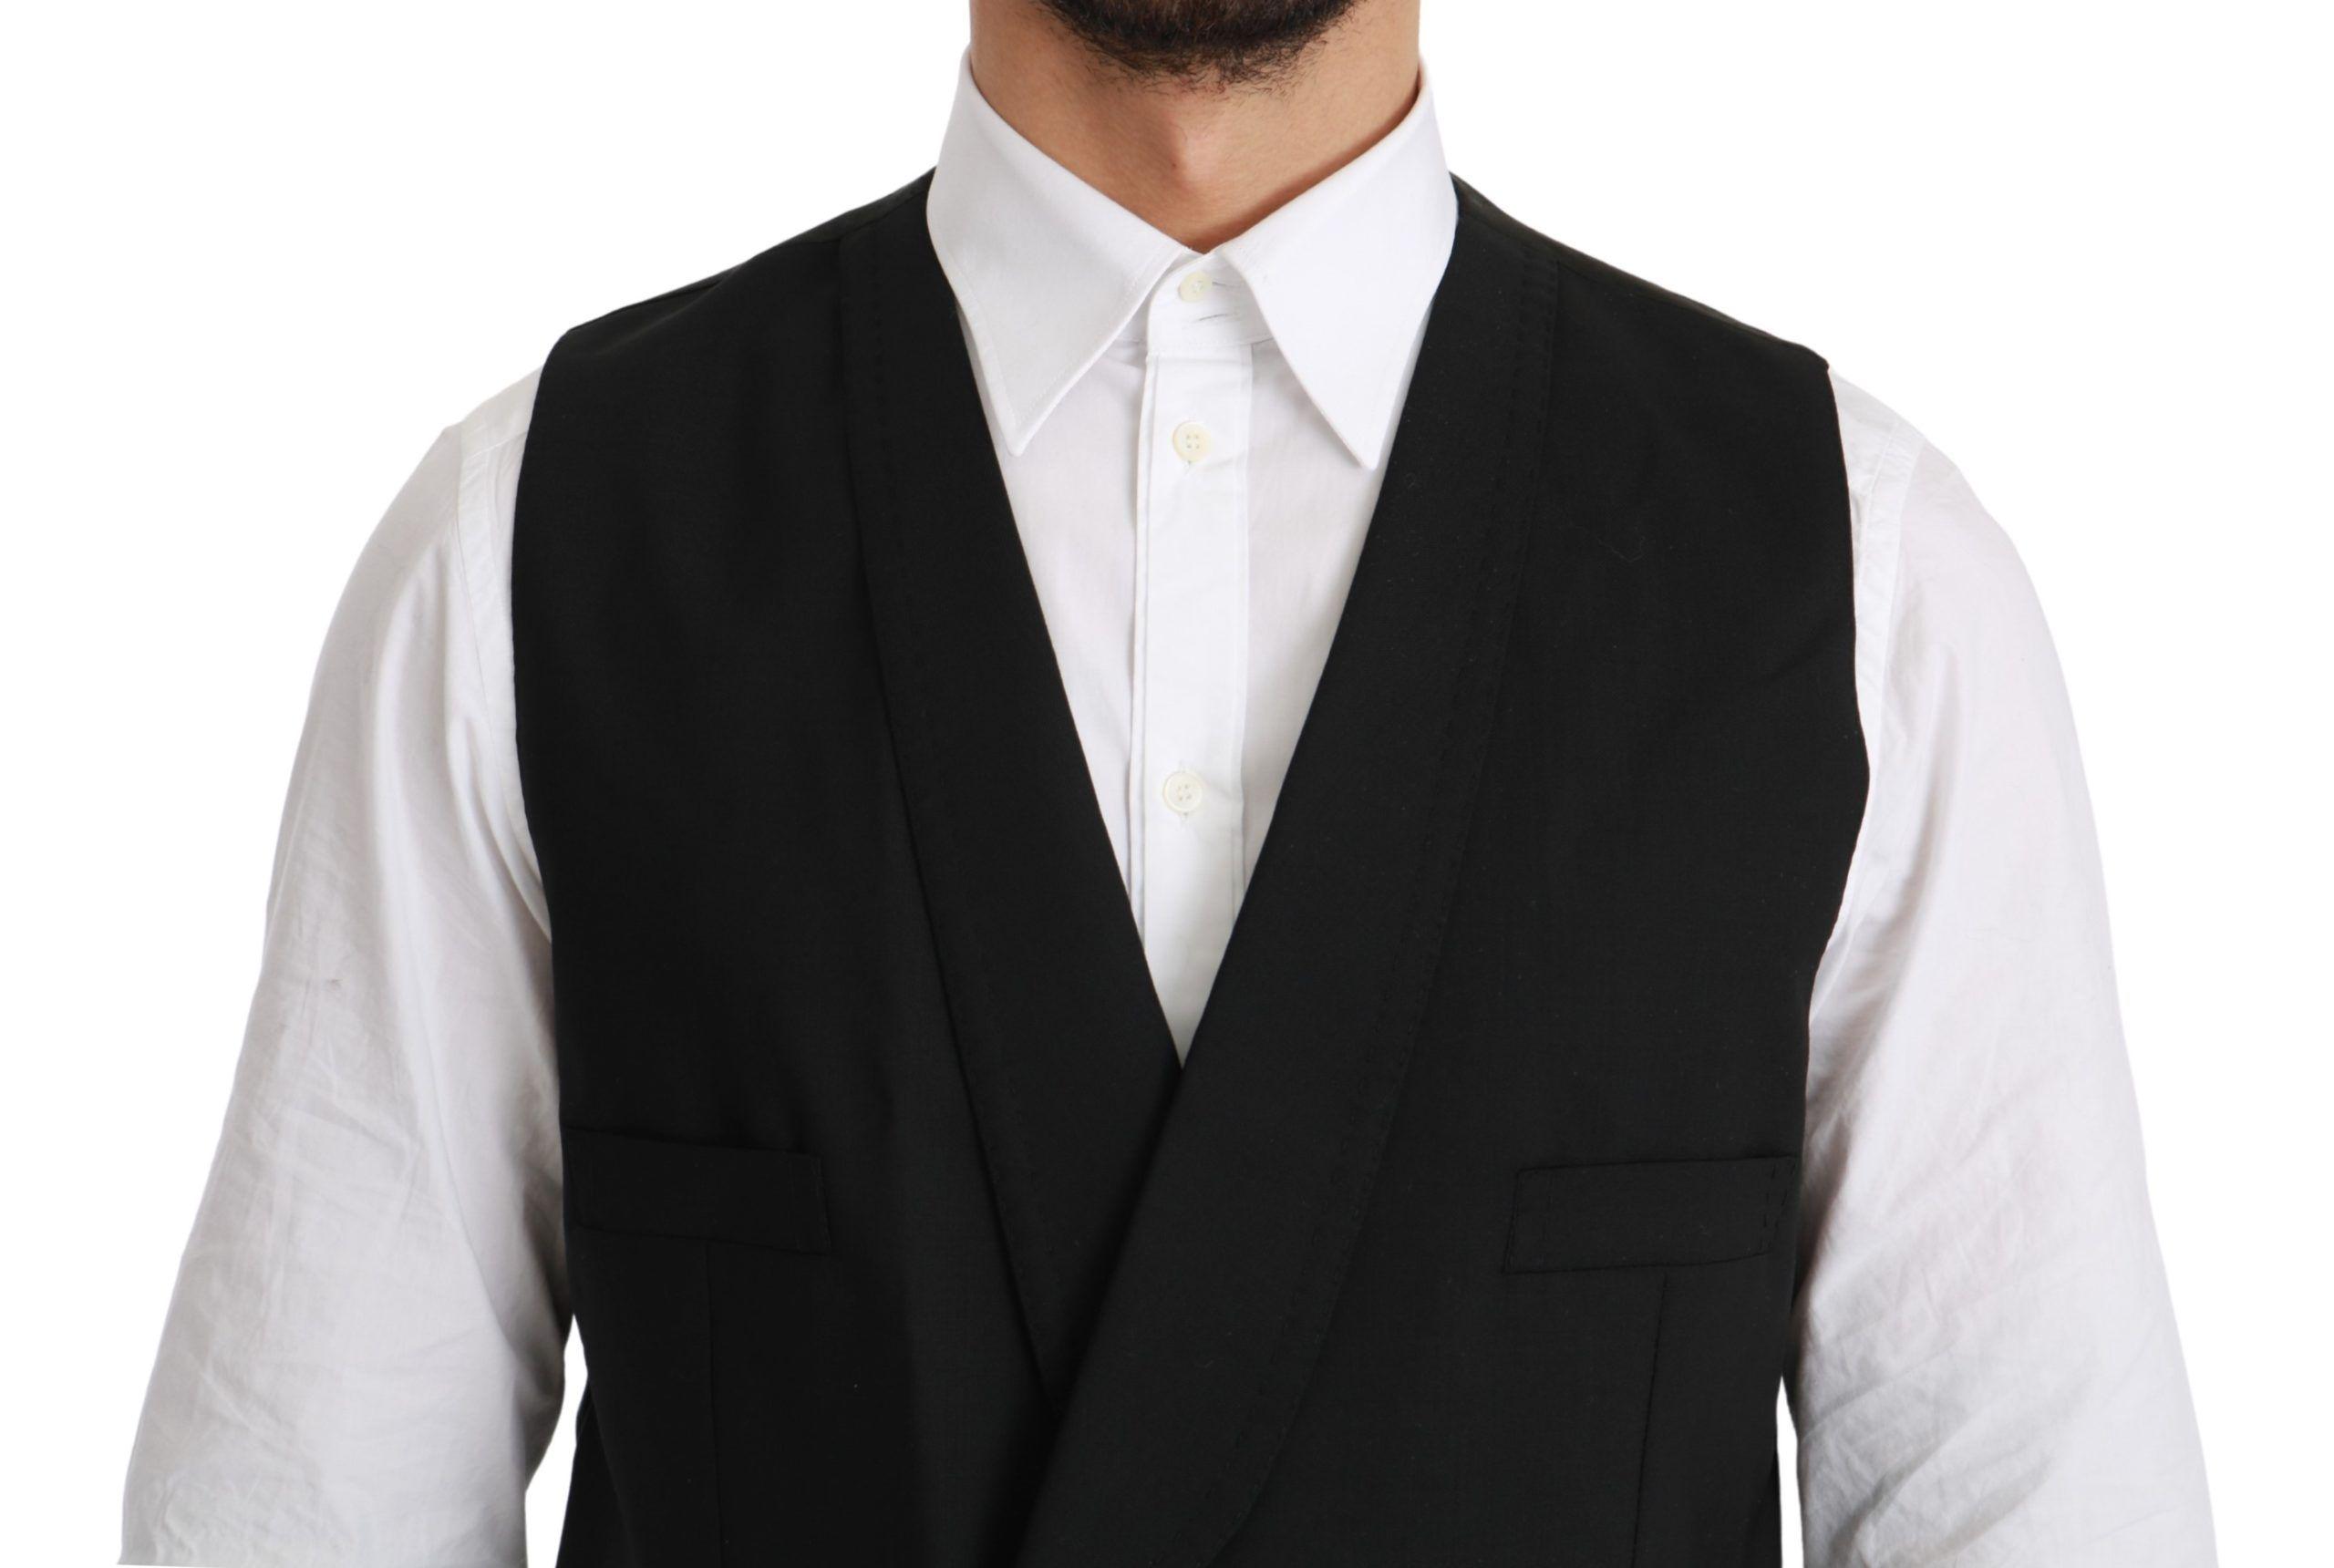 Dolce & Gabbana Black Waistcoat Formal Double Breasted Vest